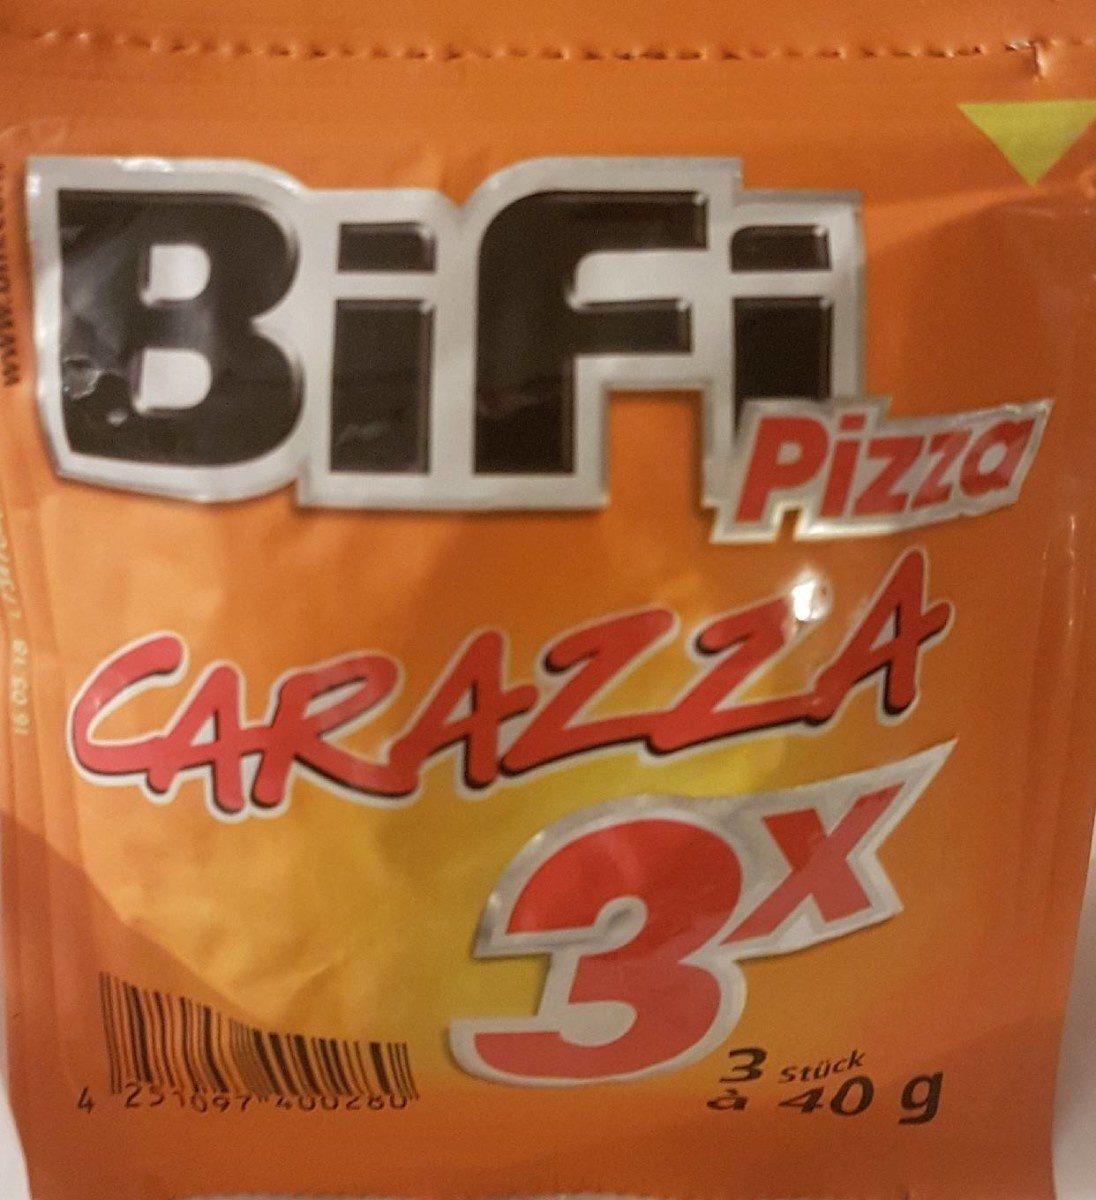 Carazza 3x - Produit - fr